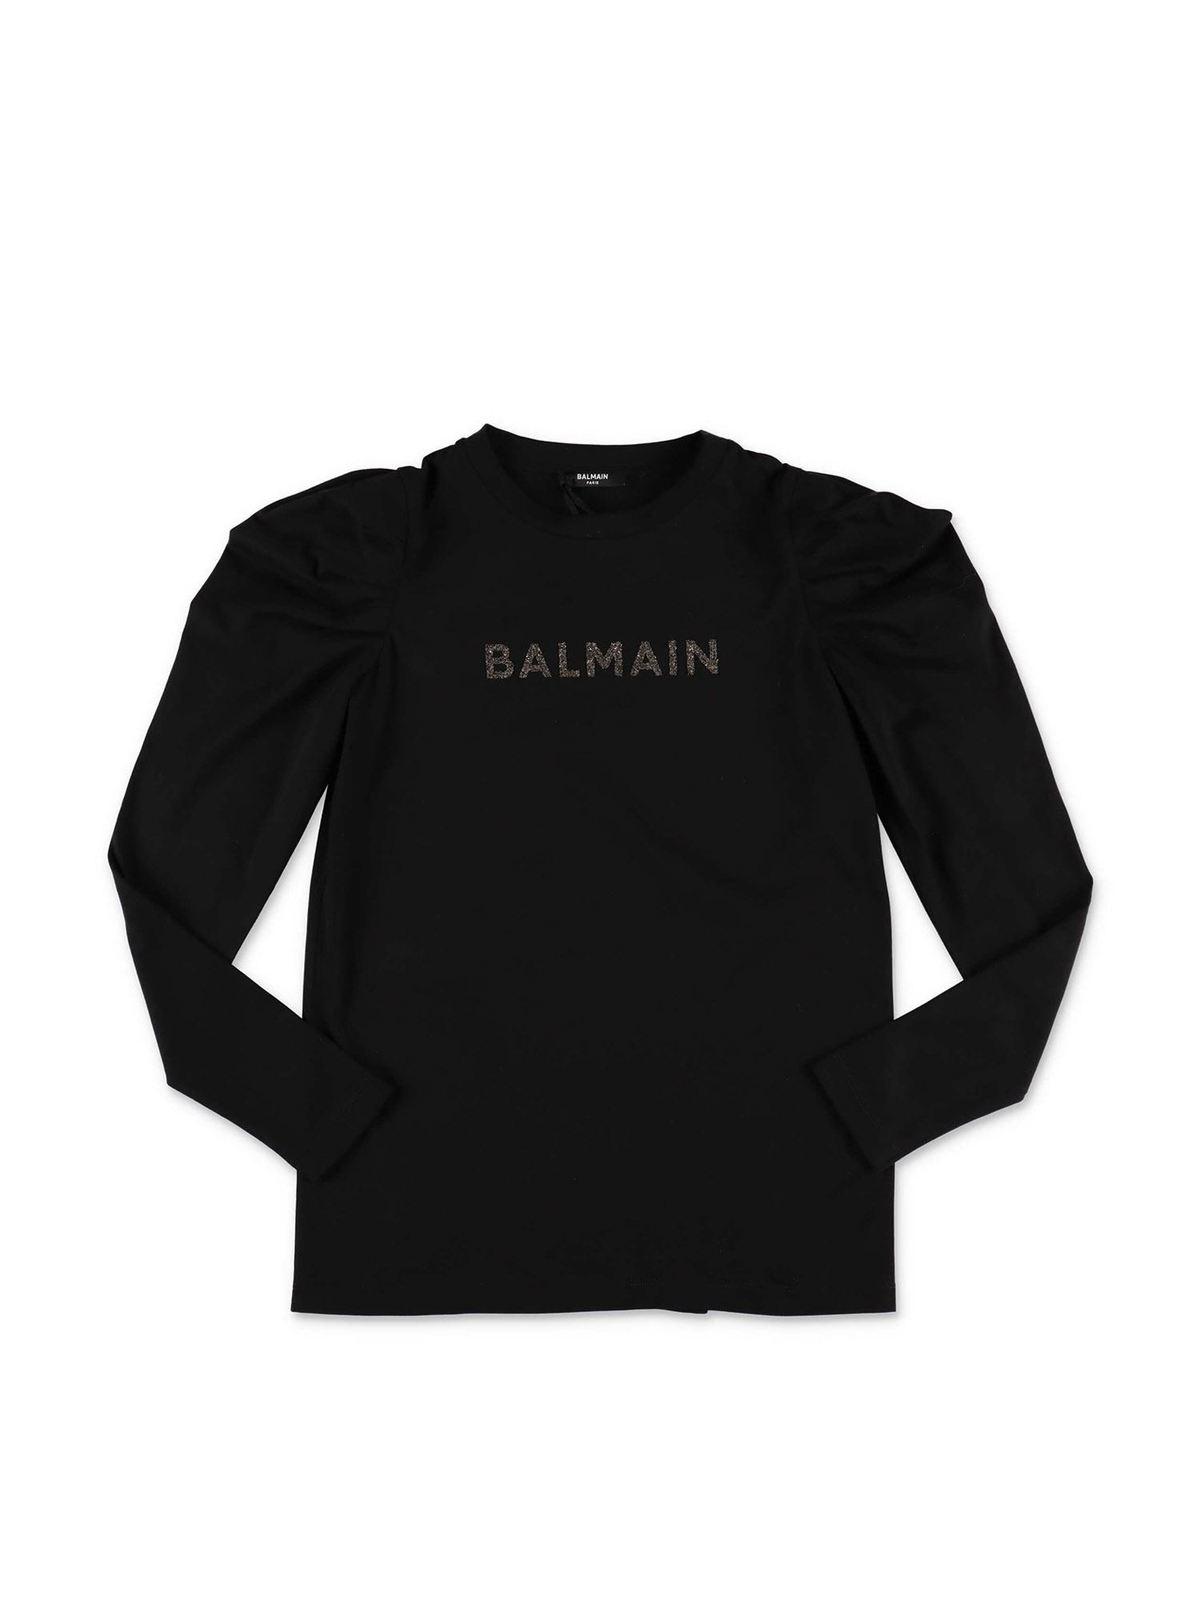 Balmain Cottons BLACK T-SHIRT WITH CRYSTAL PRINT